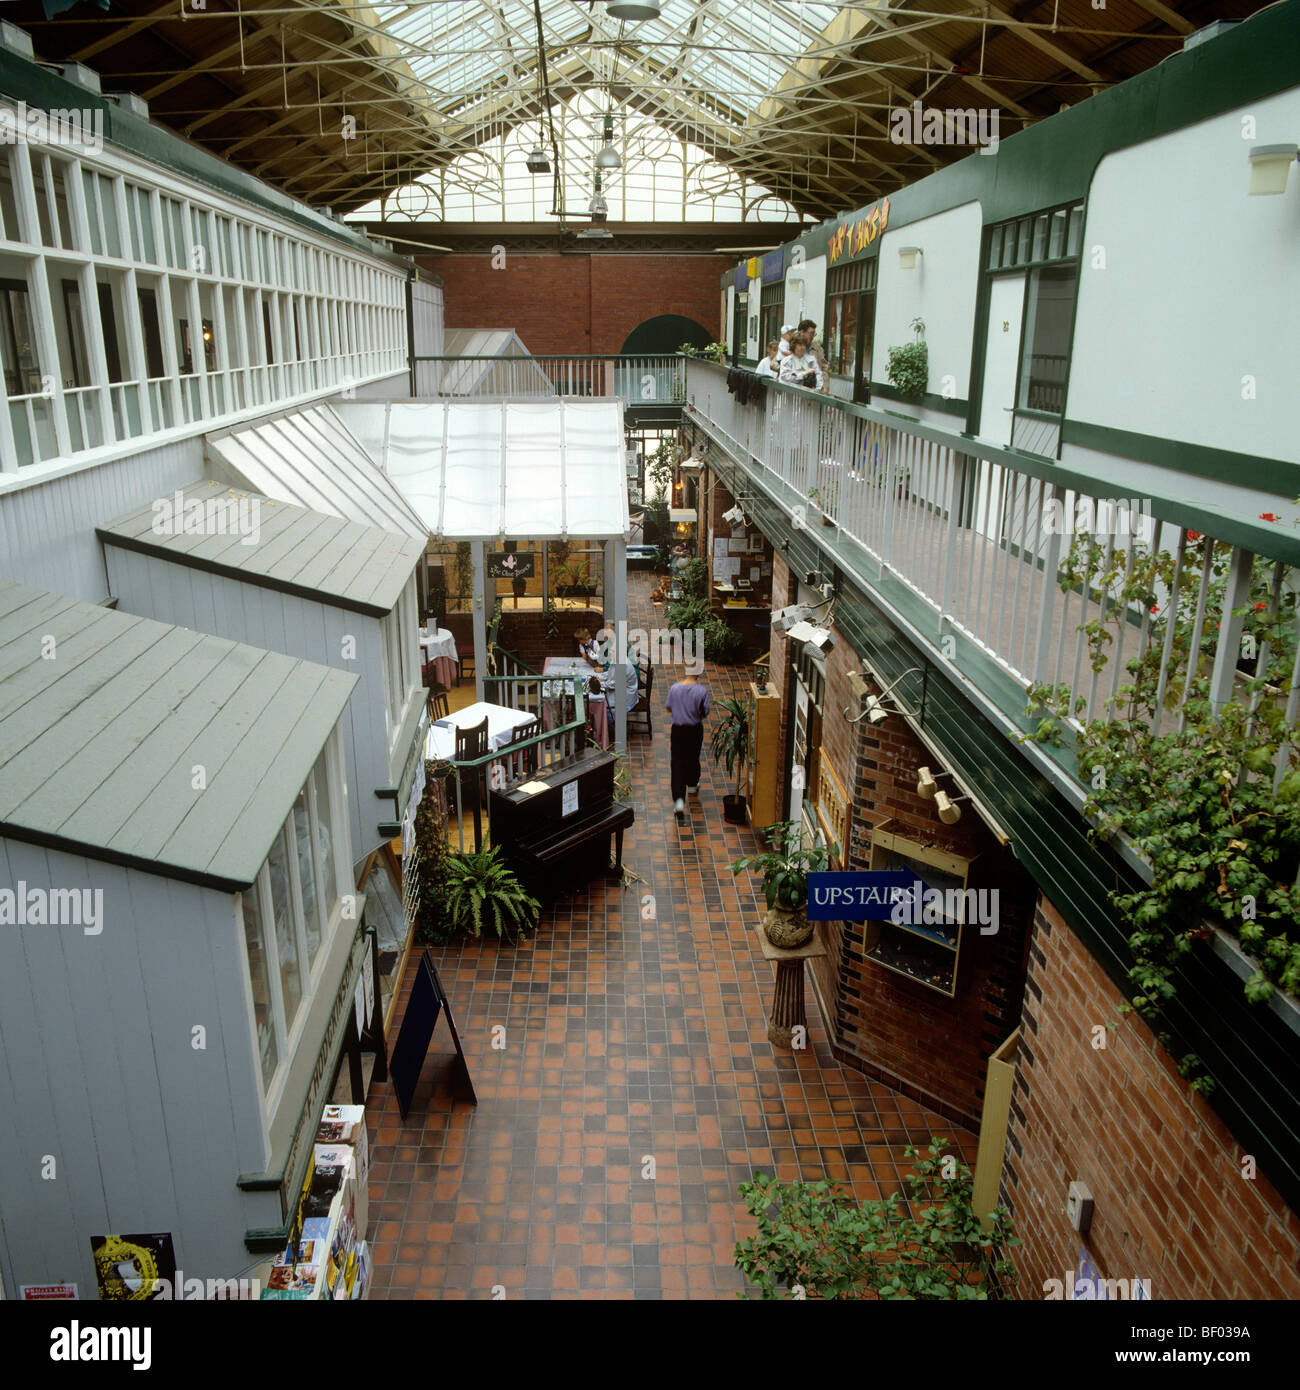 UK, England, Manchester High Street, Craft Centre - Stock Image